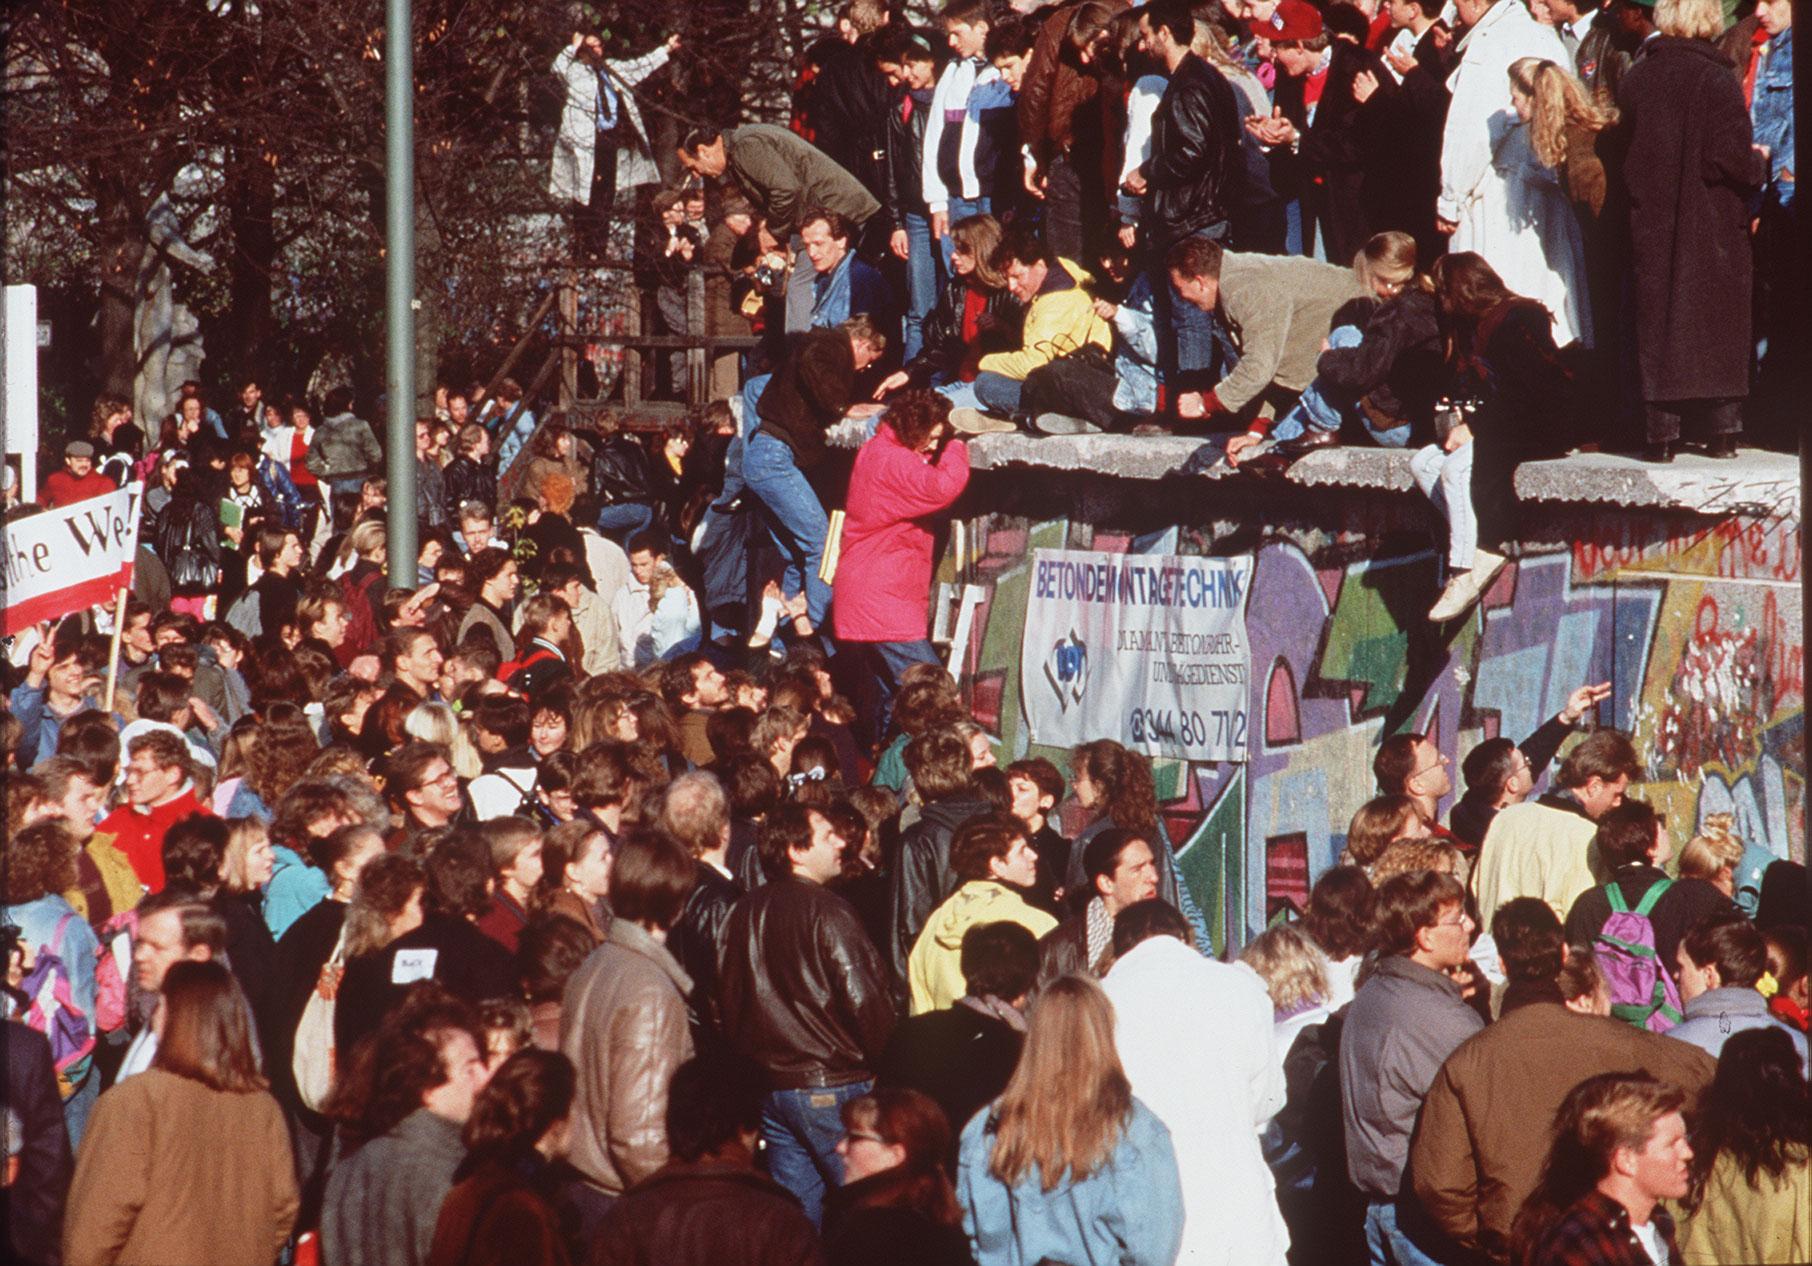 Cómo Juan Pablo II Resquebrajó el Muro de Berlín a través de Polonia